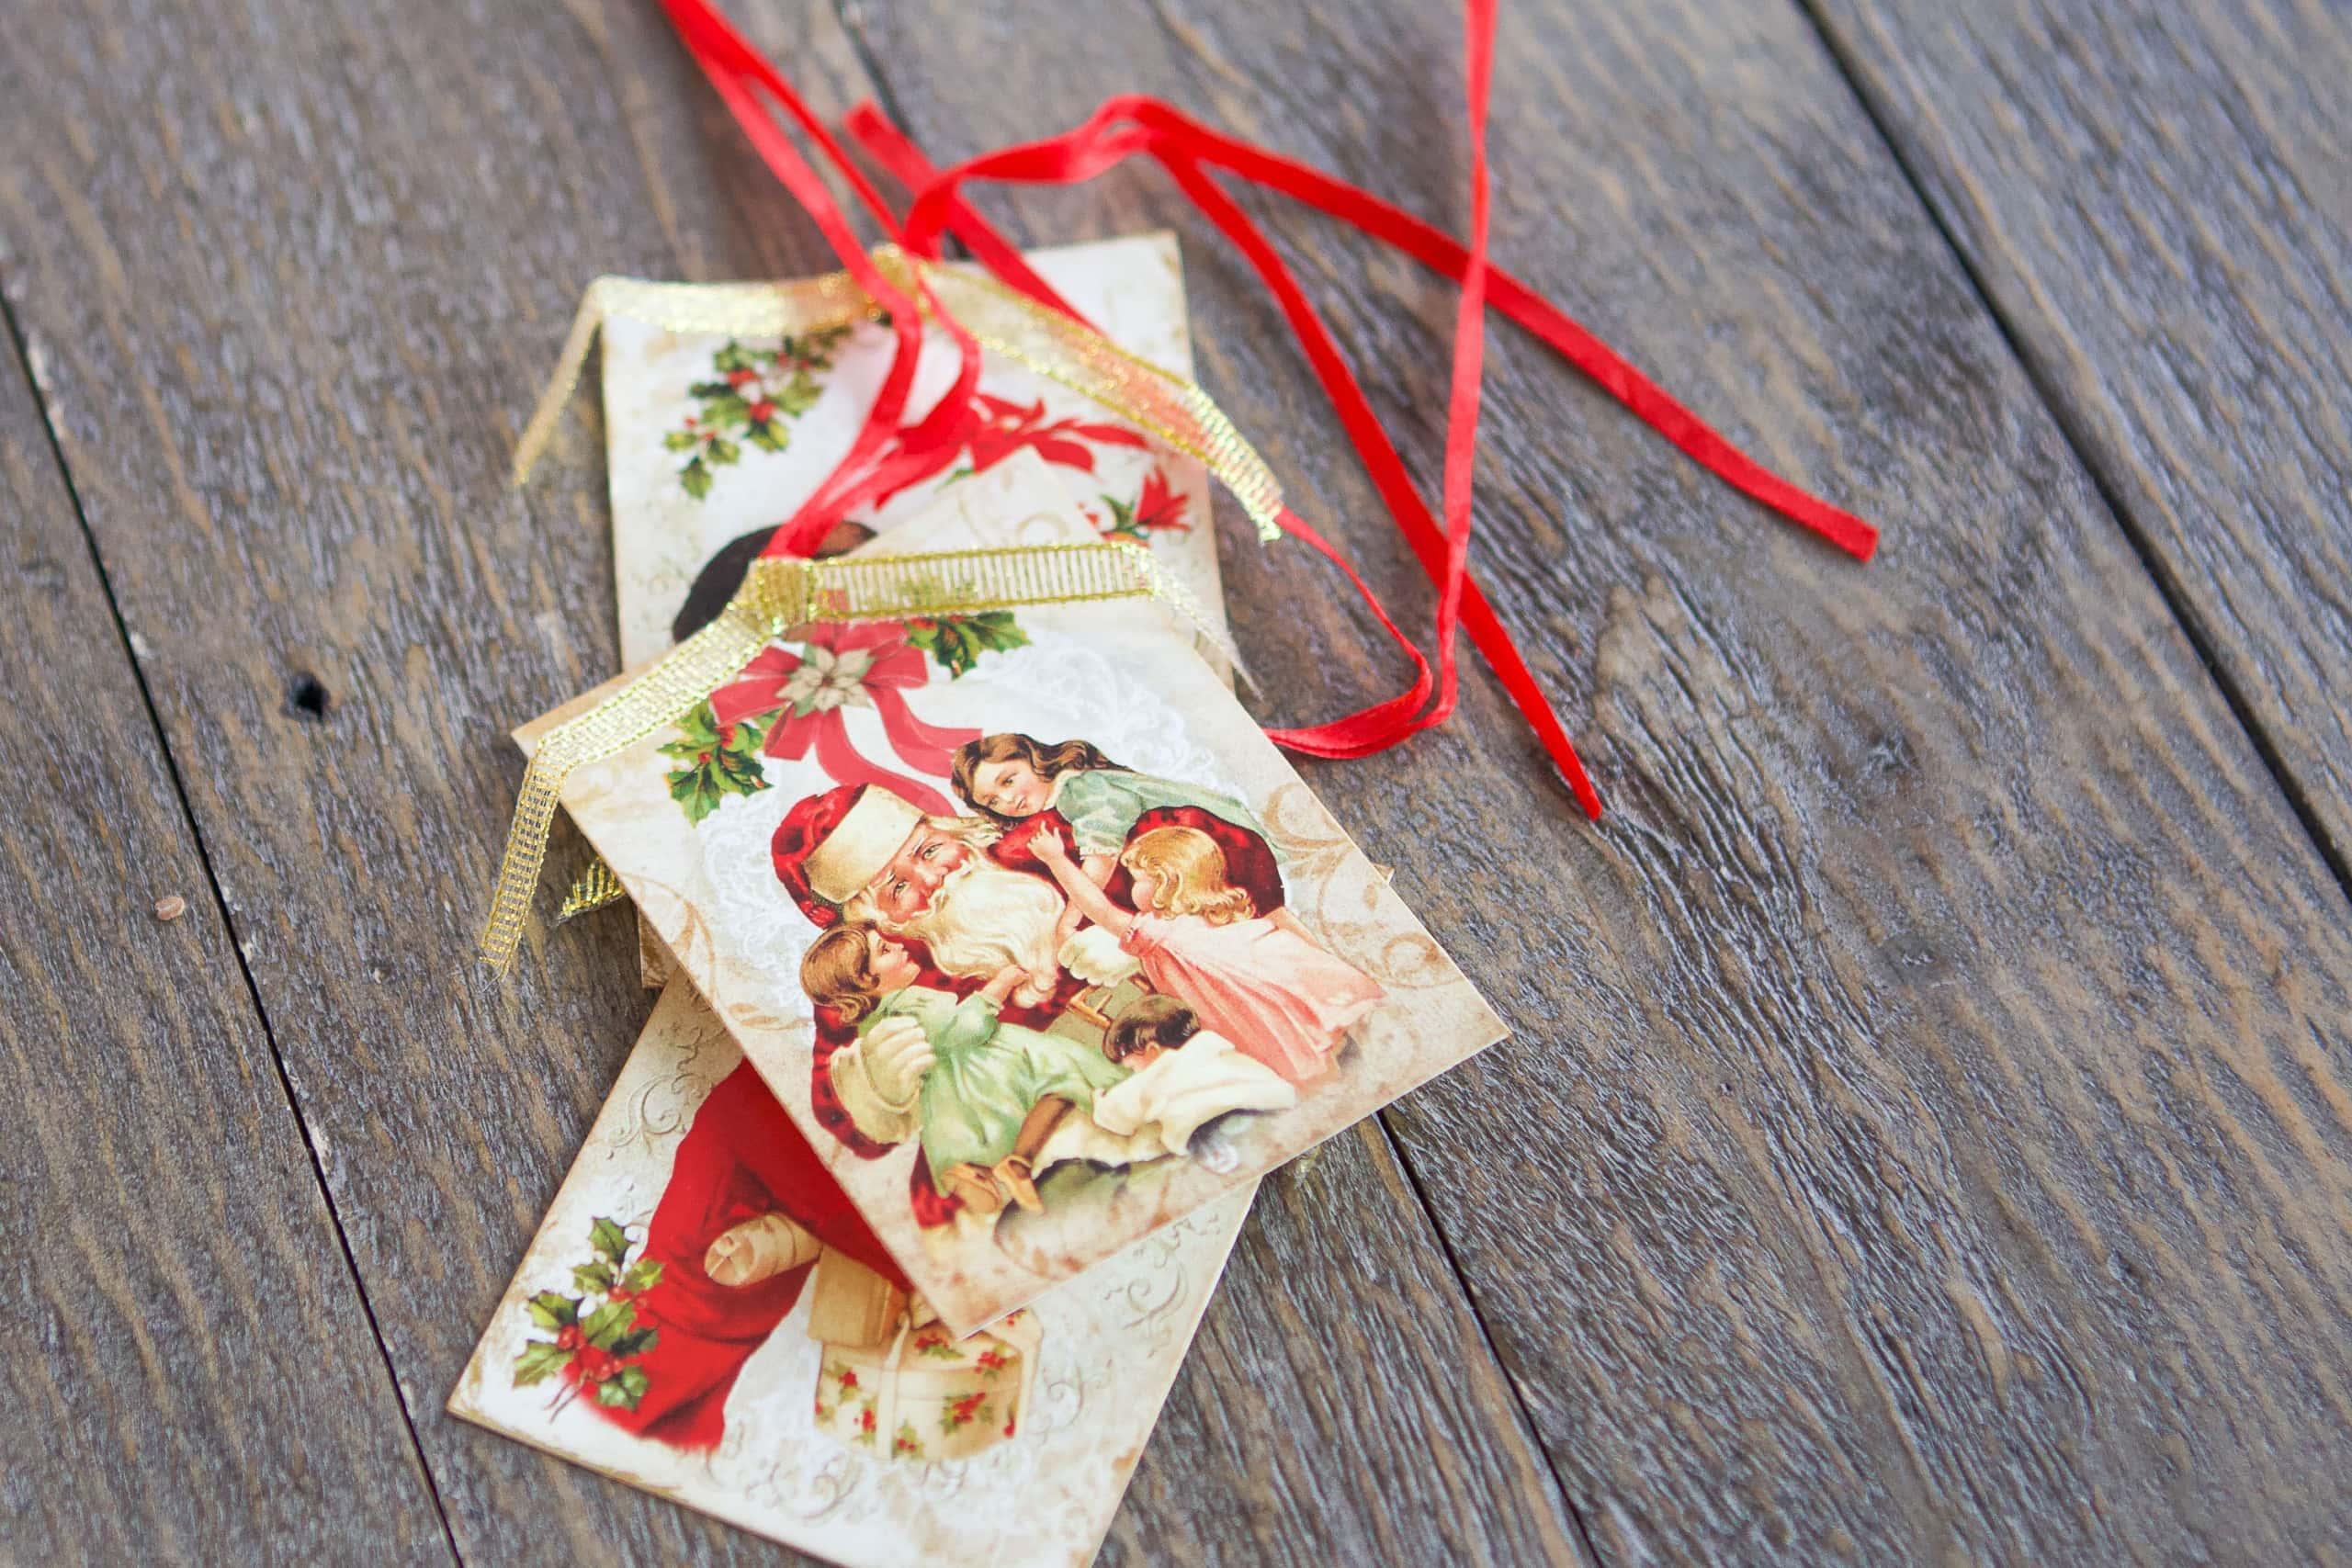 Use vintage gift tags